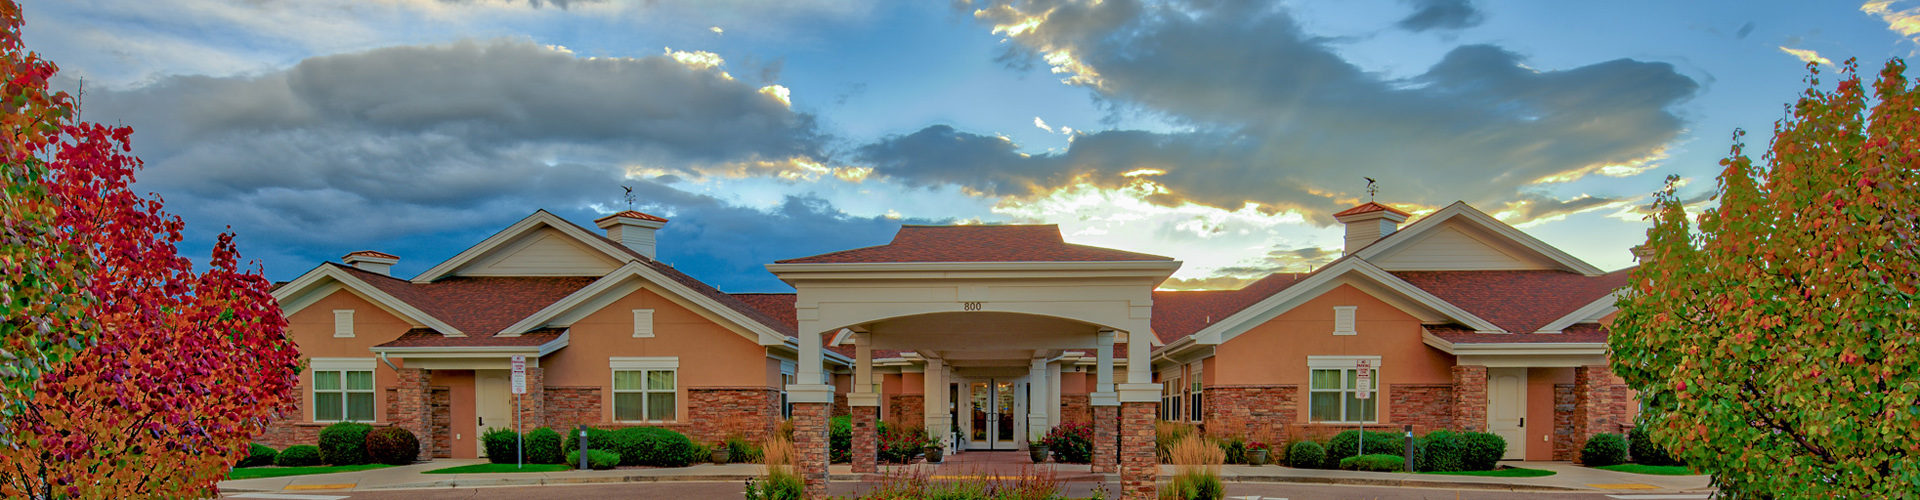 Memory Care Centre in Longmont - AltaVita Living